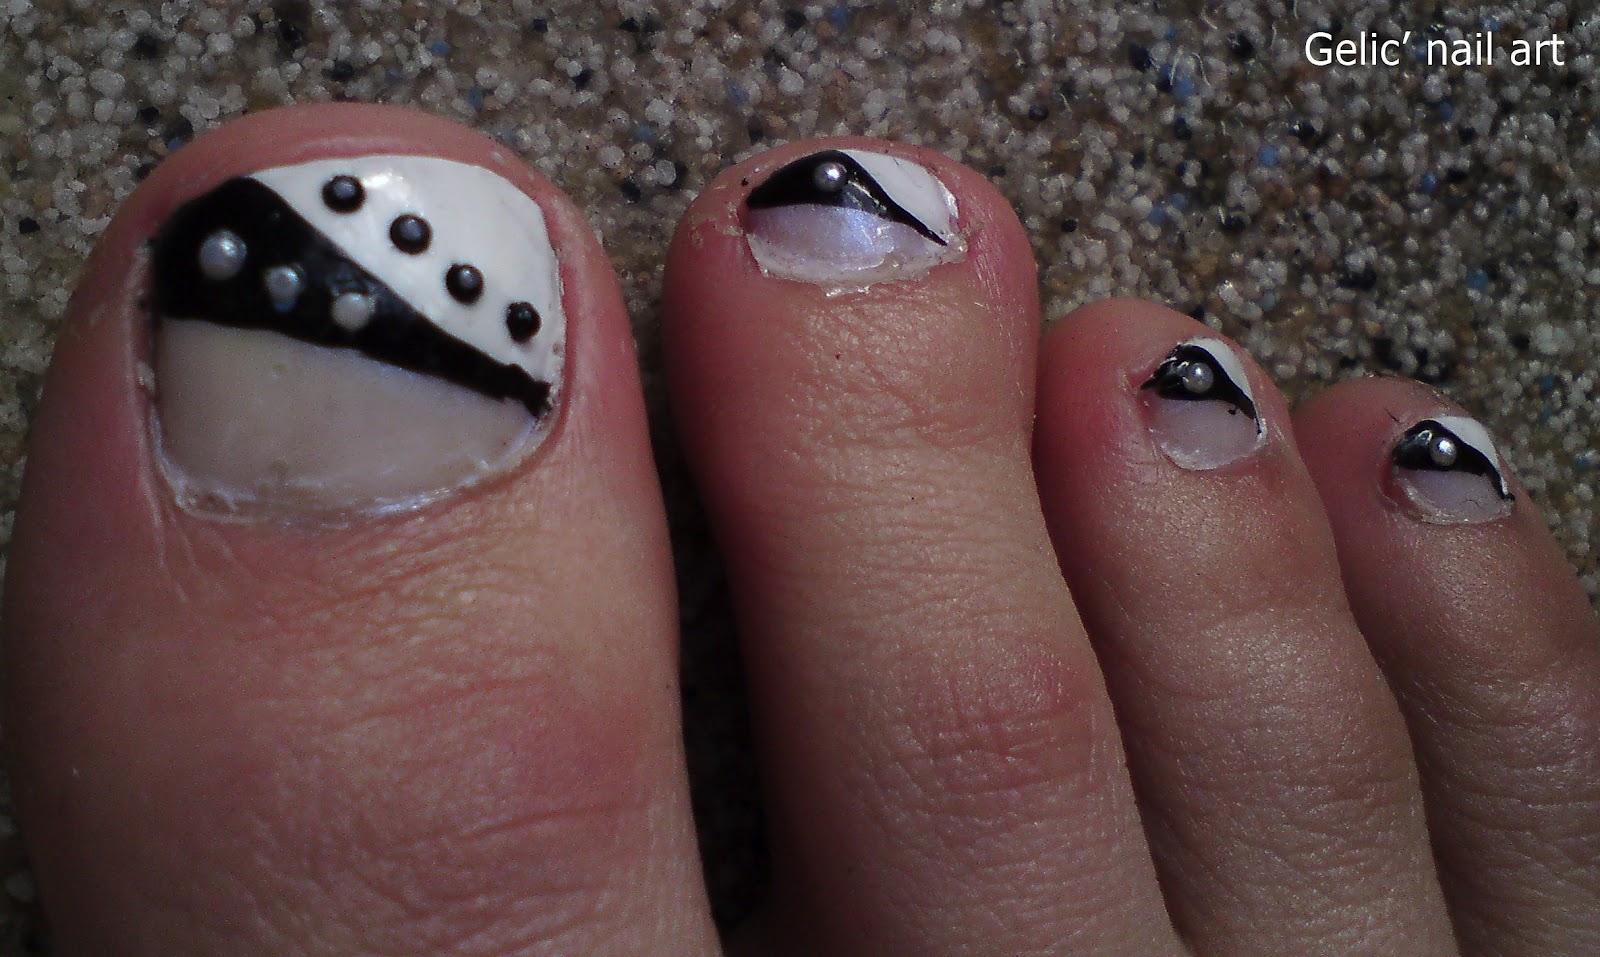 Black and White Toe Nail Art